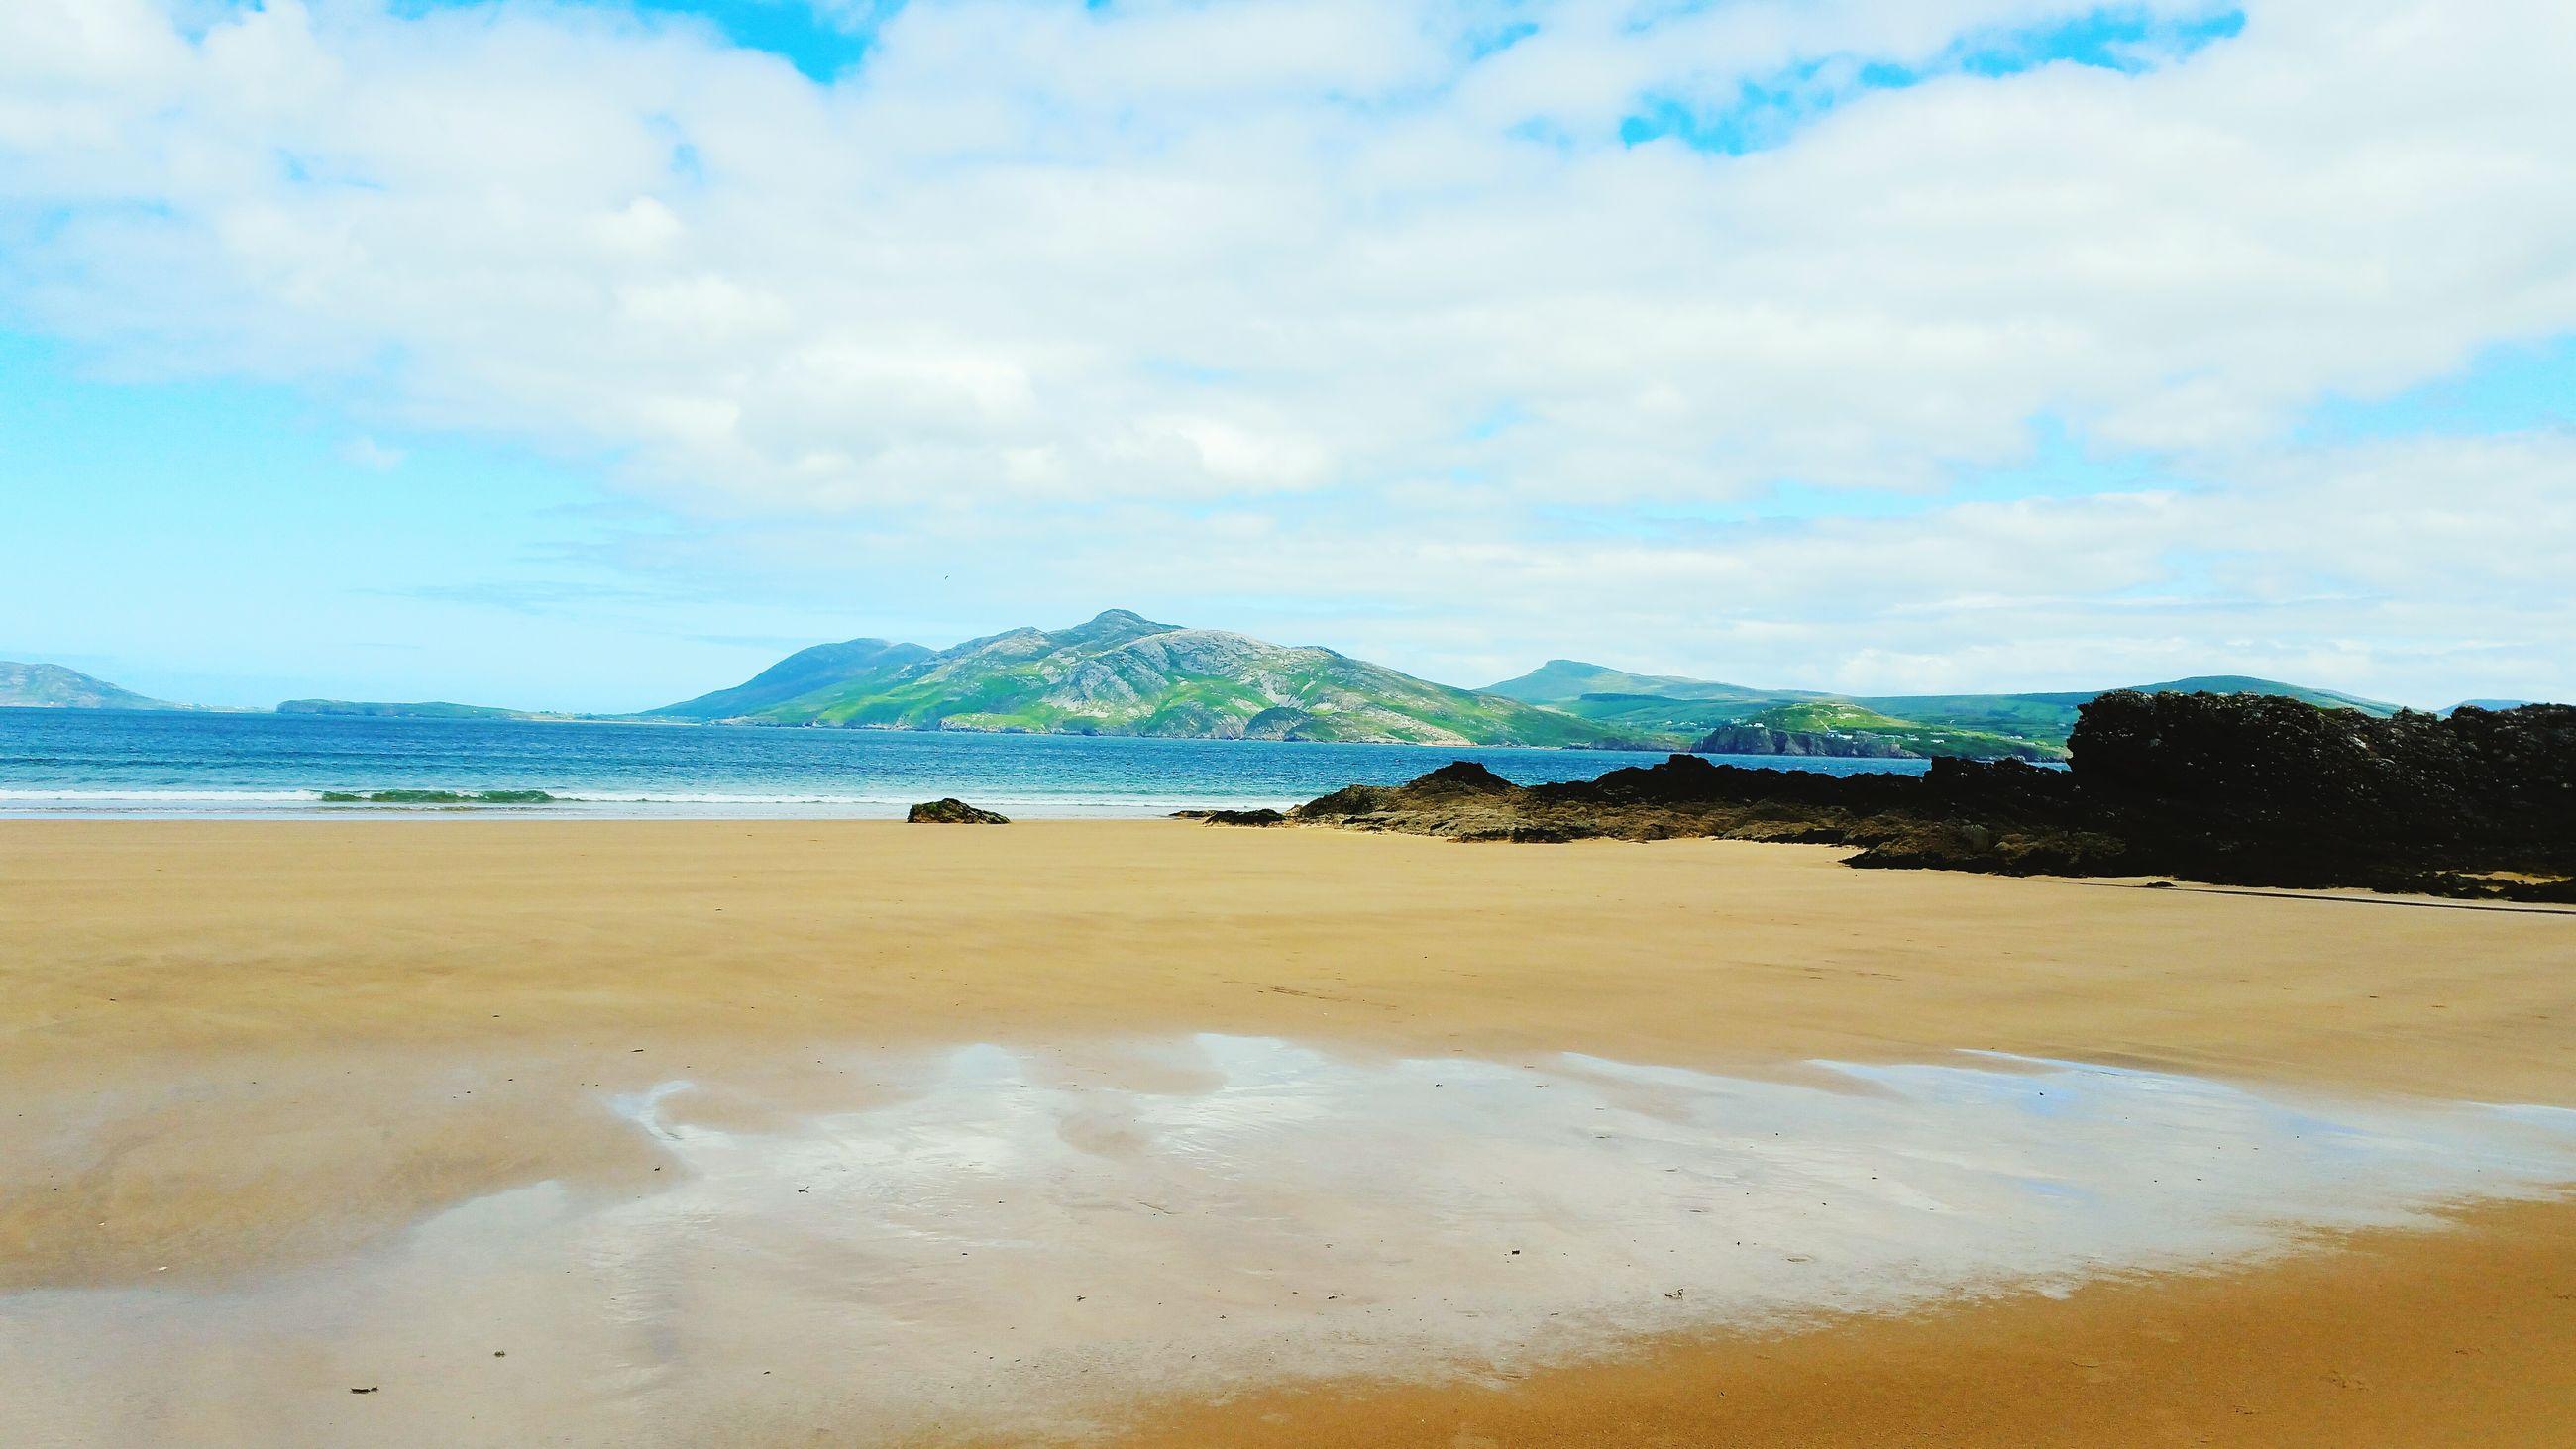 beach, sky, sand, mountain, tranquil scene, water, tranquility, scenics, sea, beauty in nature, shore, nature, cloud - sky, idyllic, cloud, mountain range, day, non-urban scene, blue, coastline